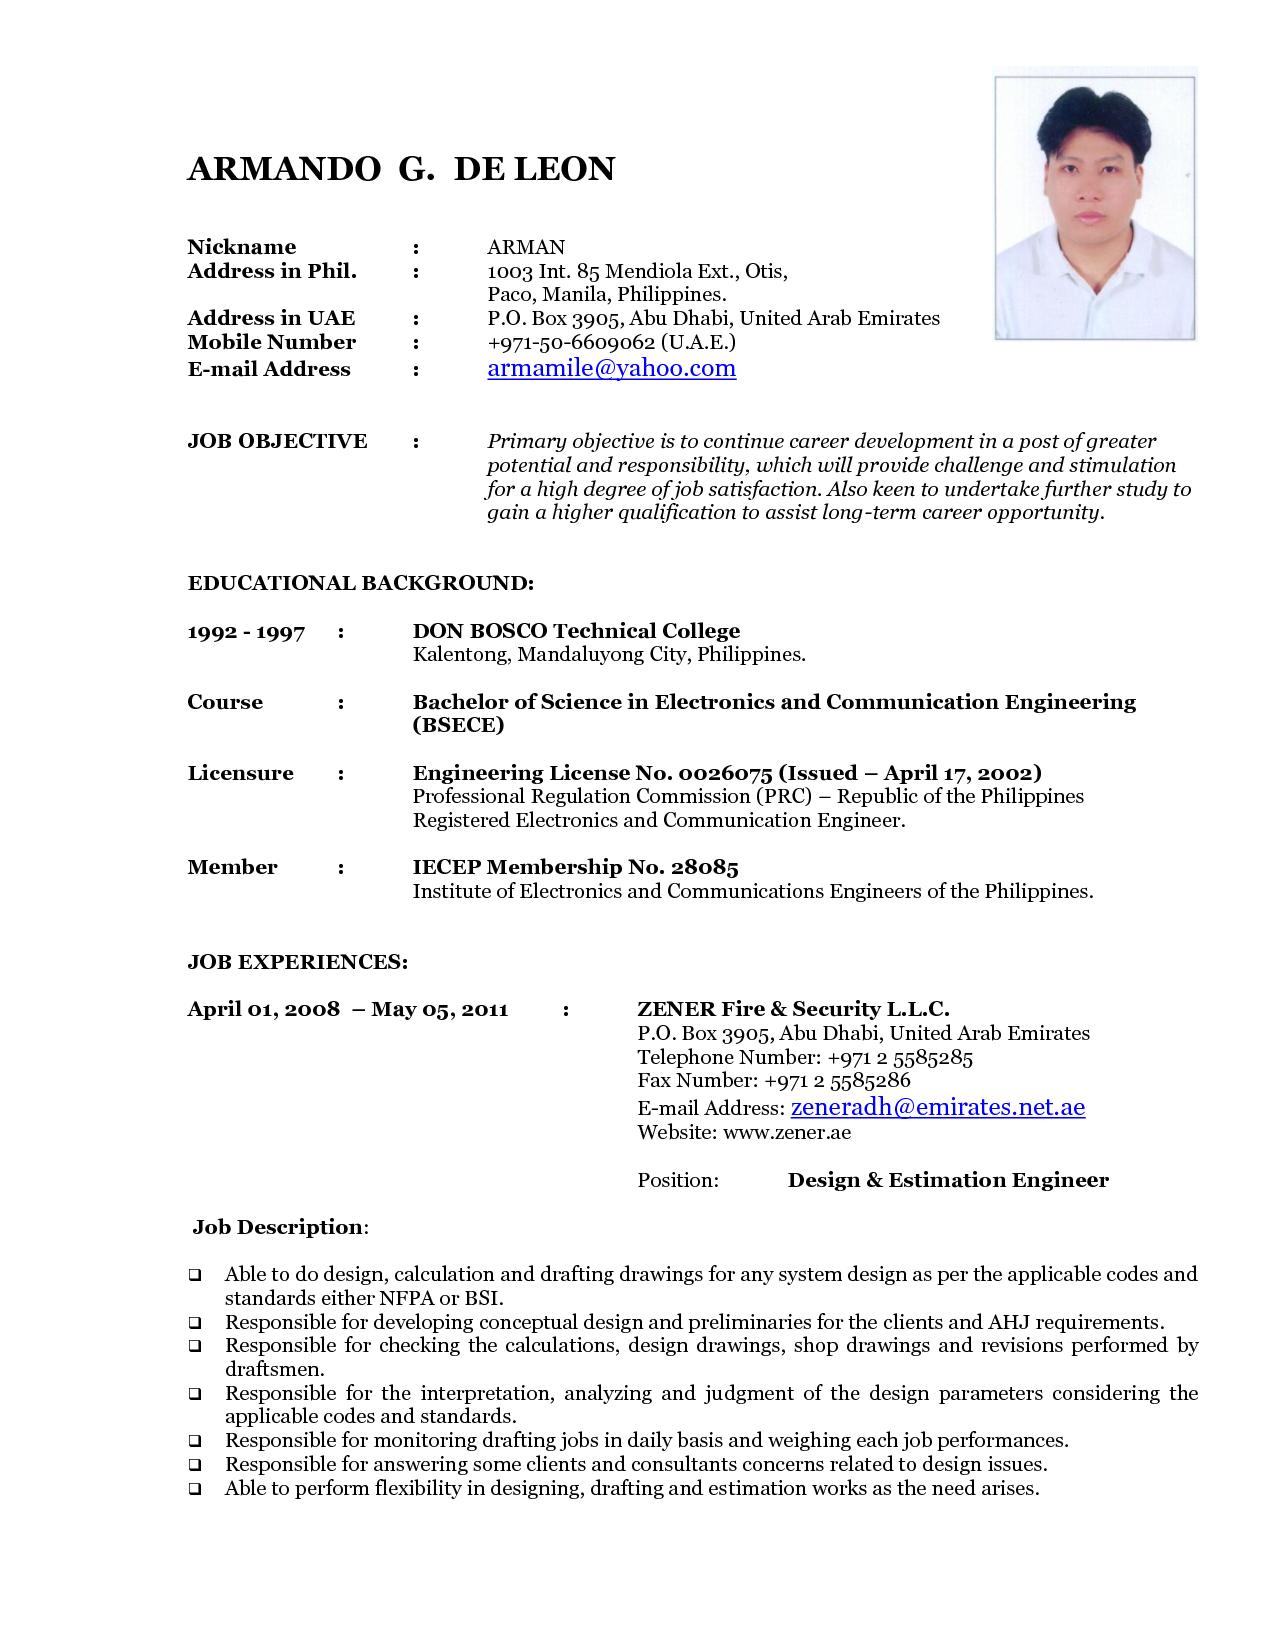 Cv Template Latest  Resume format  Latest resume format